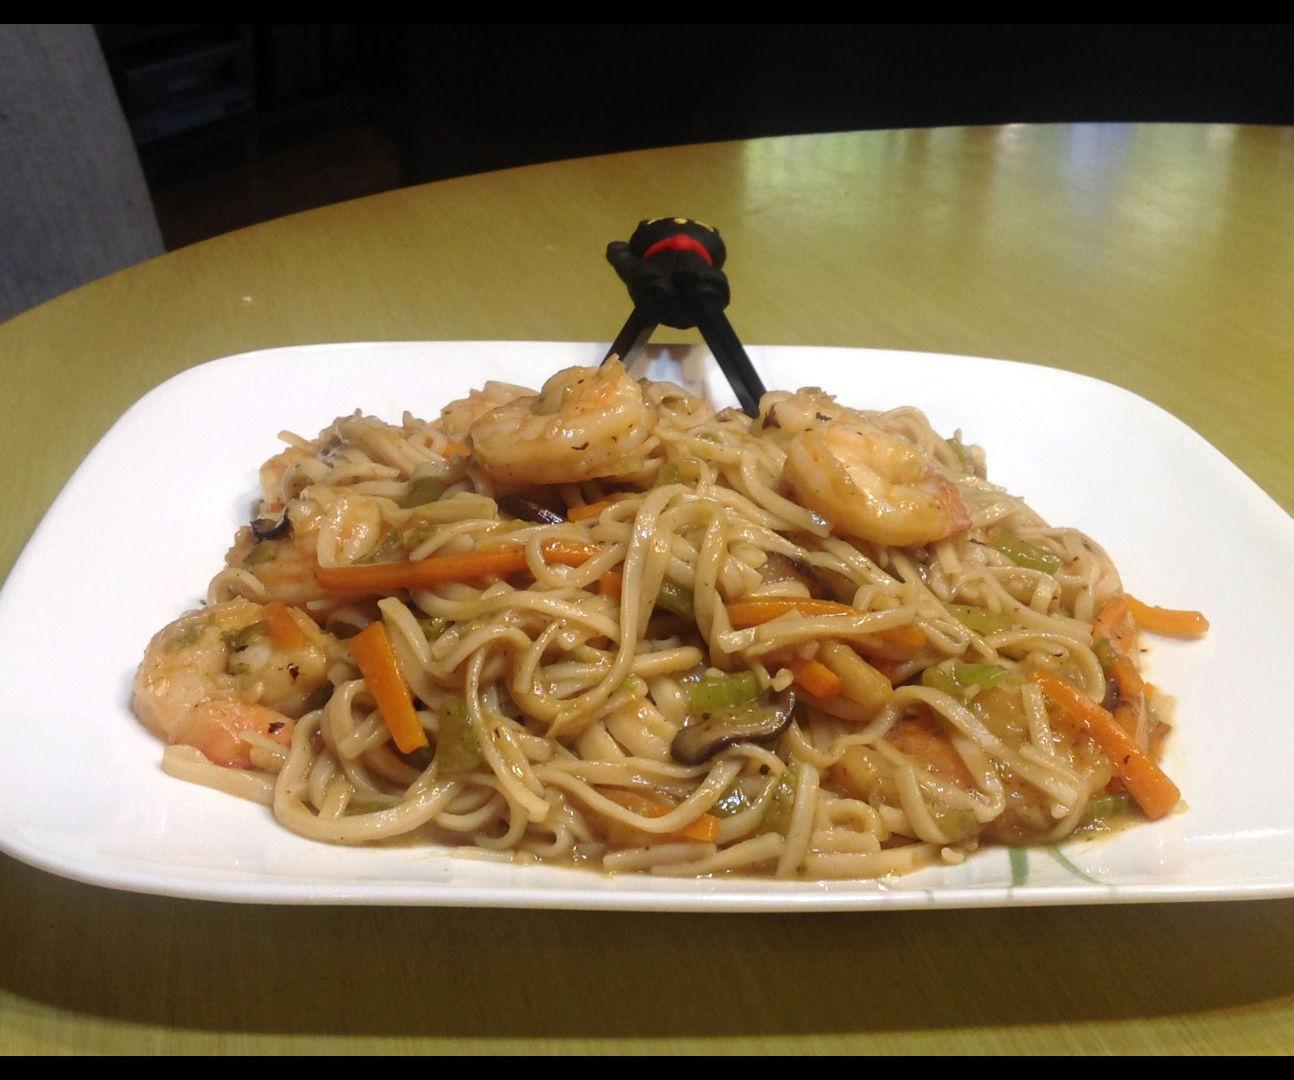 Shrimp Lo Mein - Without a Wok